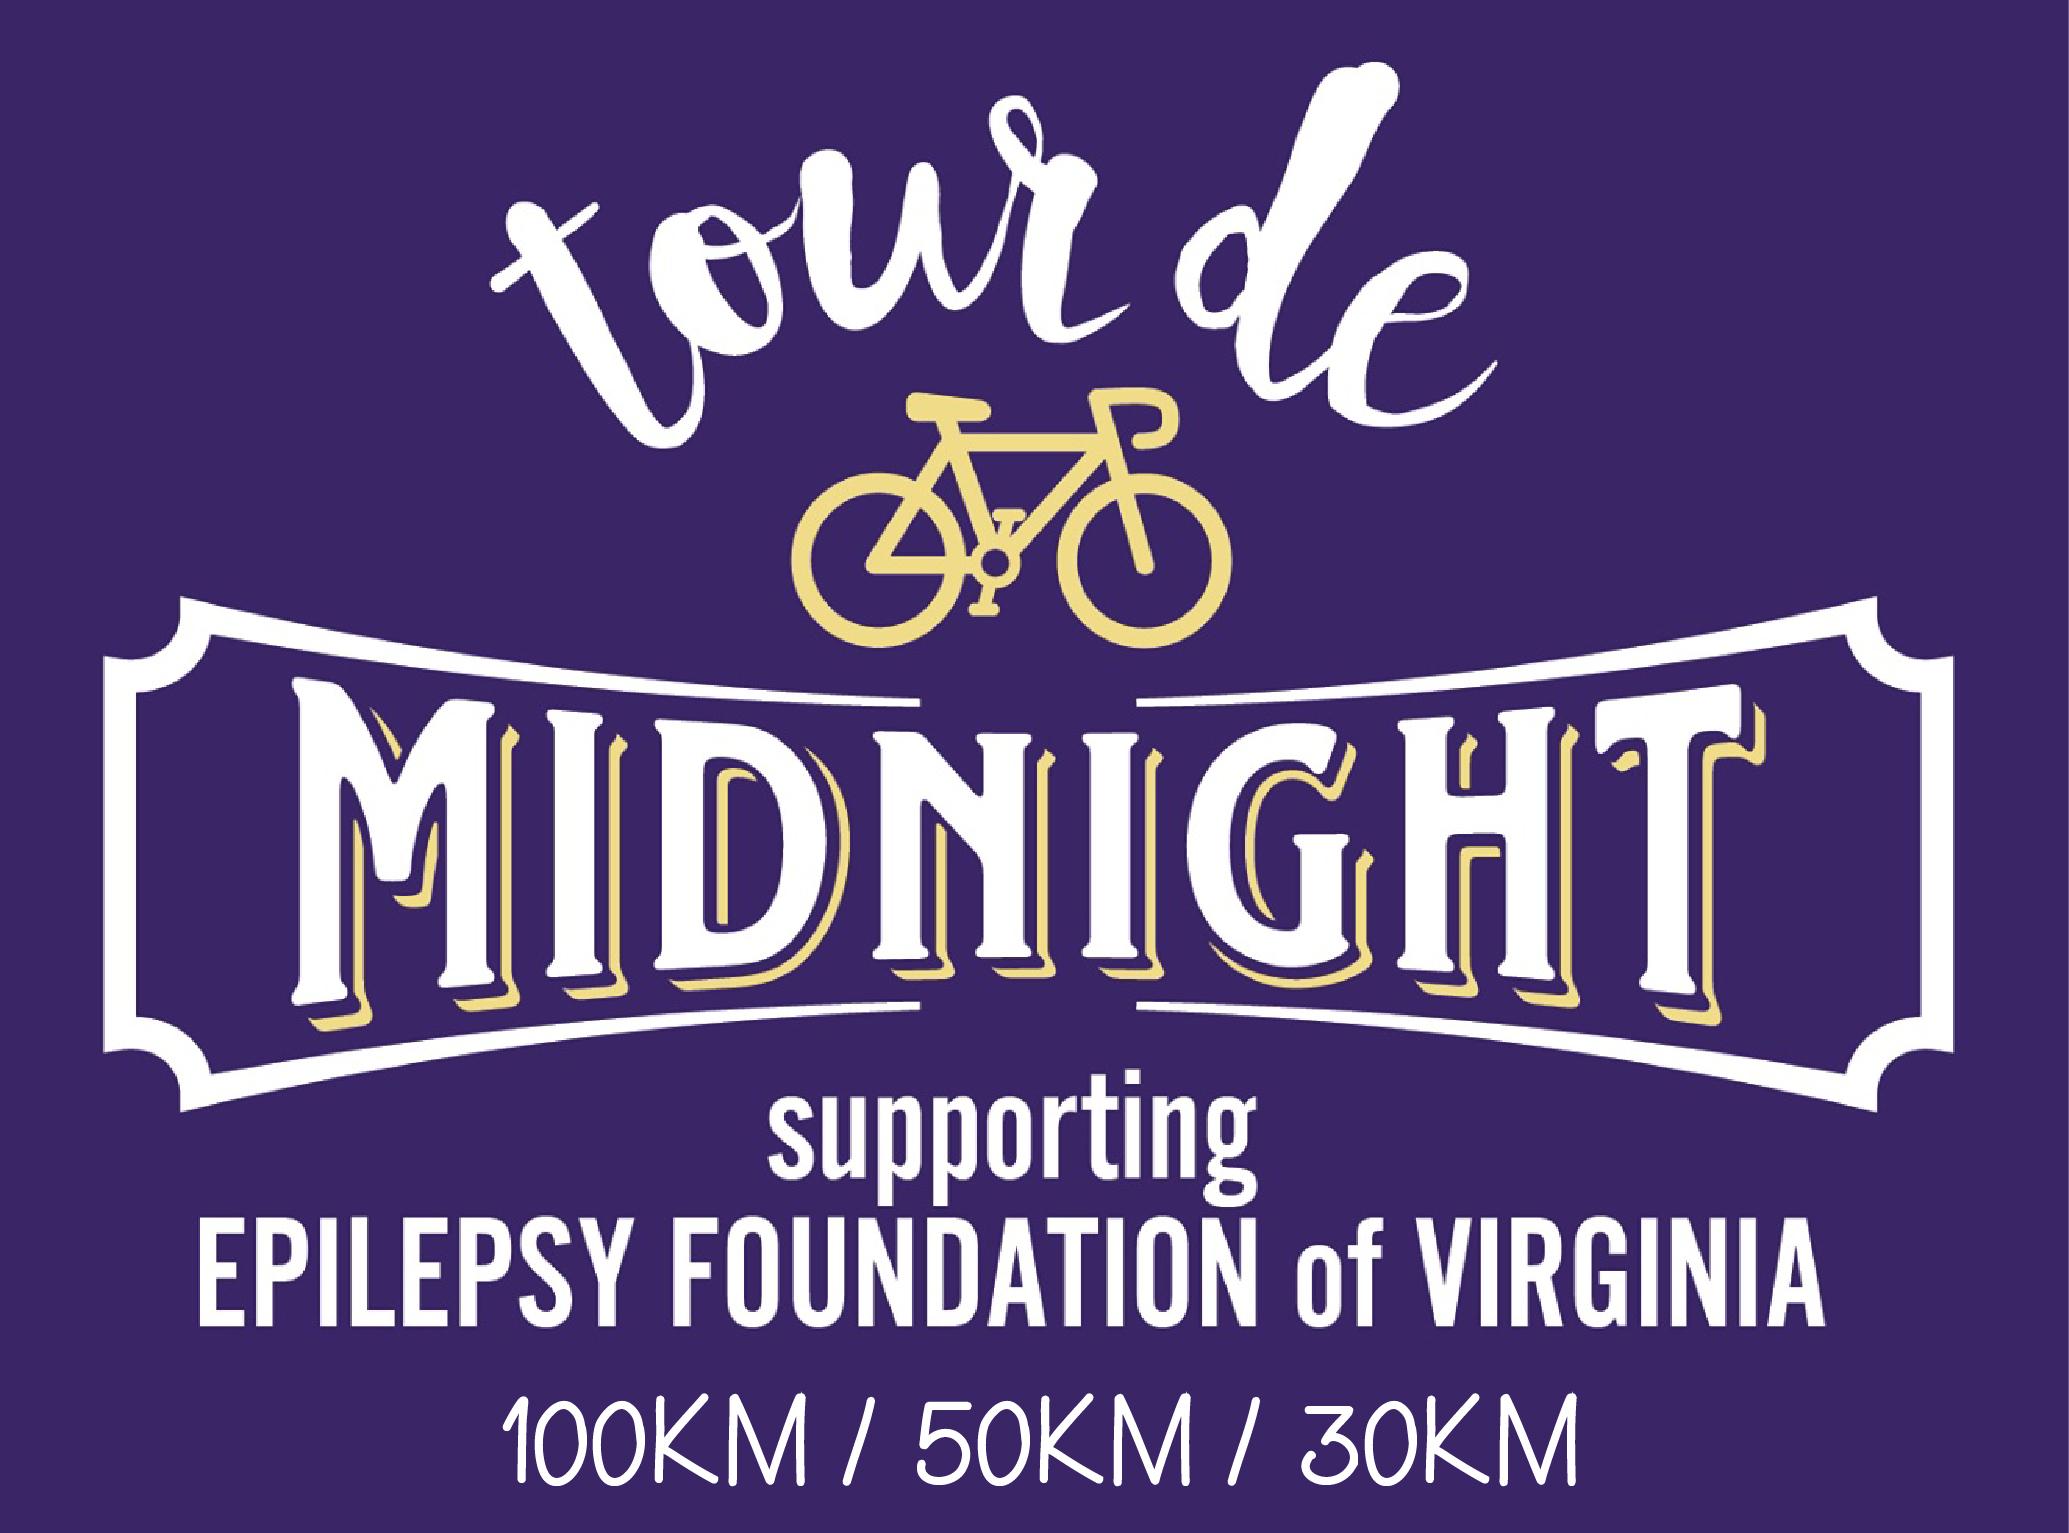 Epilepsy Foundation of Virginia